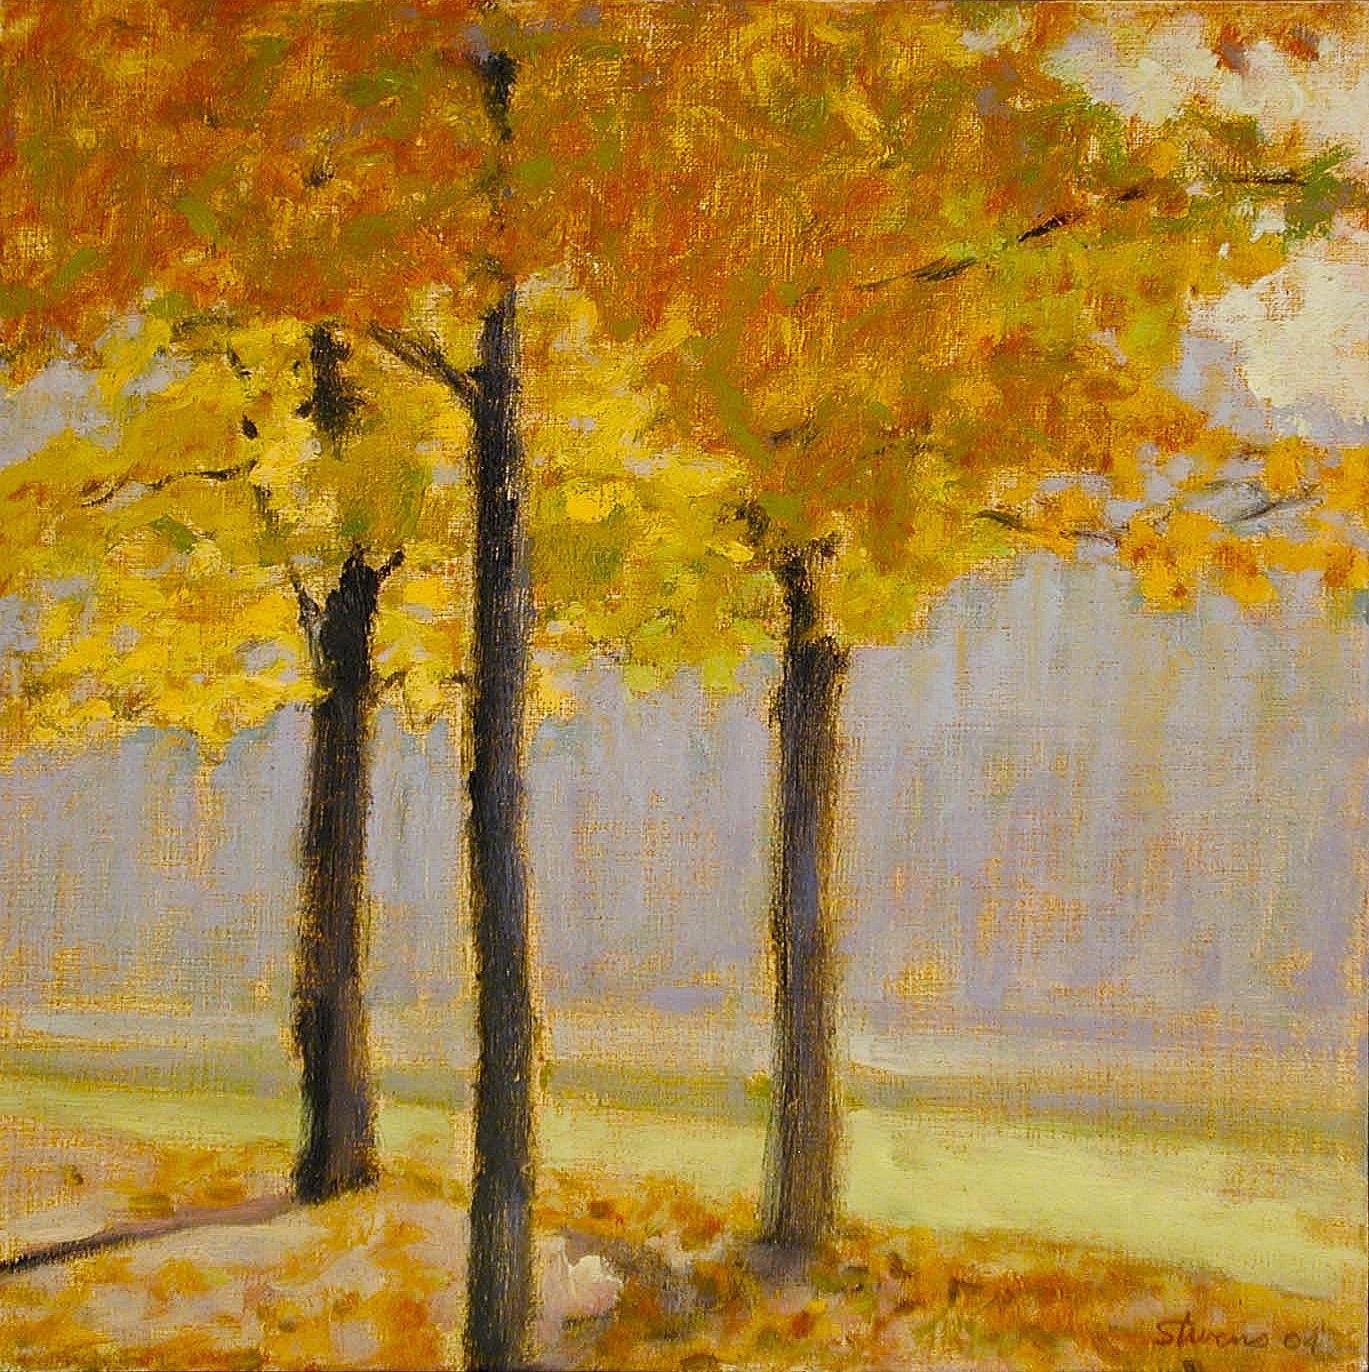 "Three Trees, Long Lake Park  | oil on linen | 12 x 12"" | 2004"